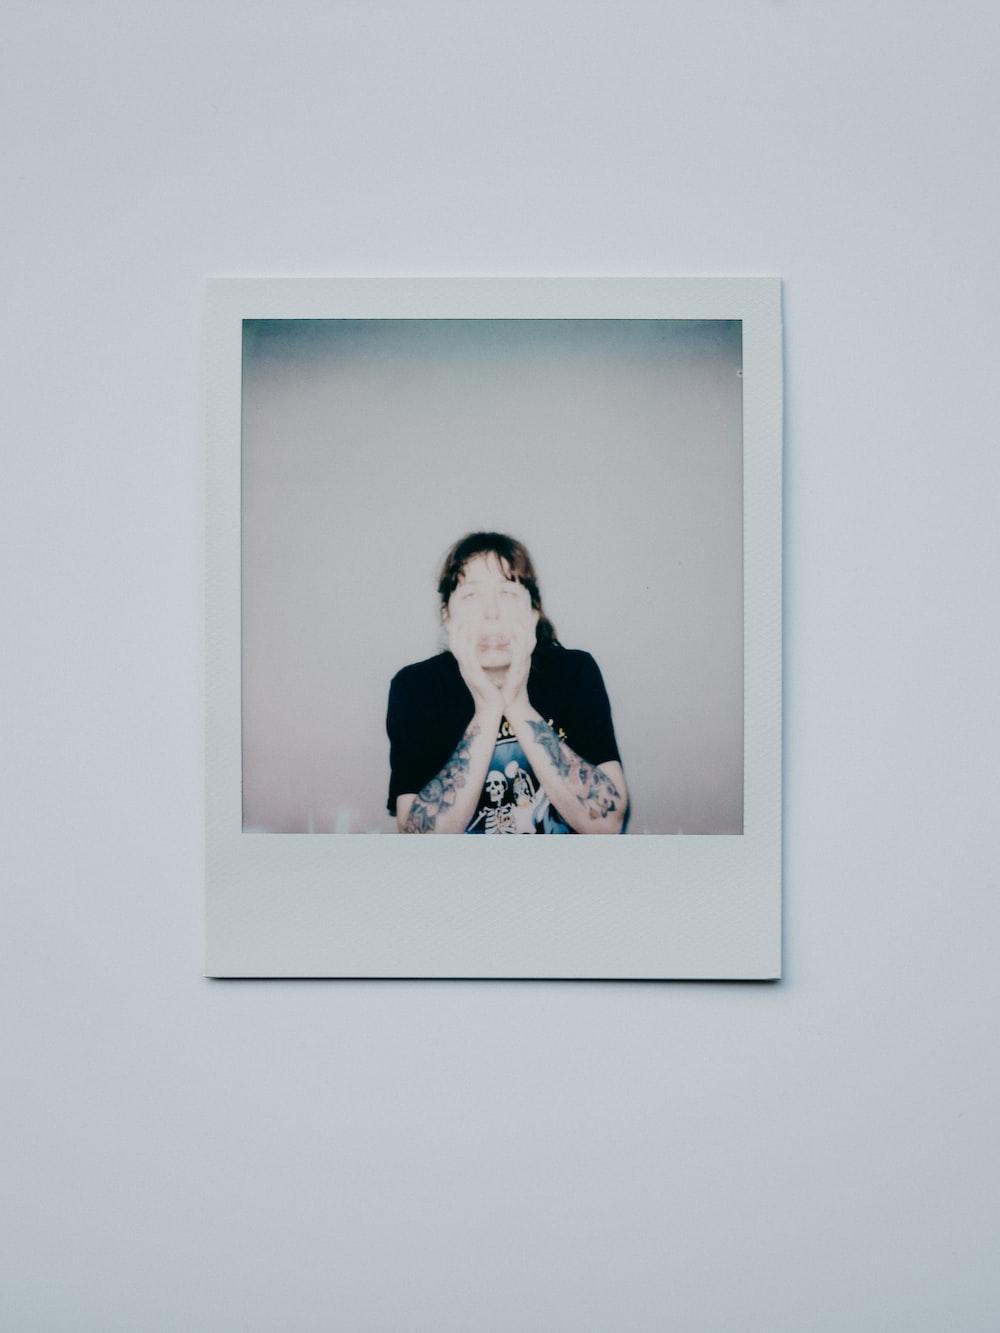 woman in black shirt photo